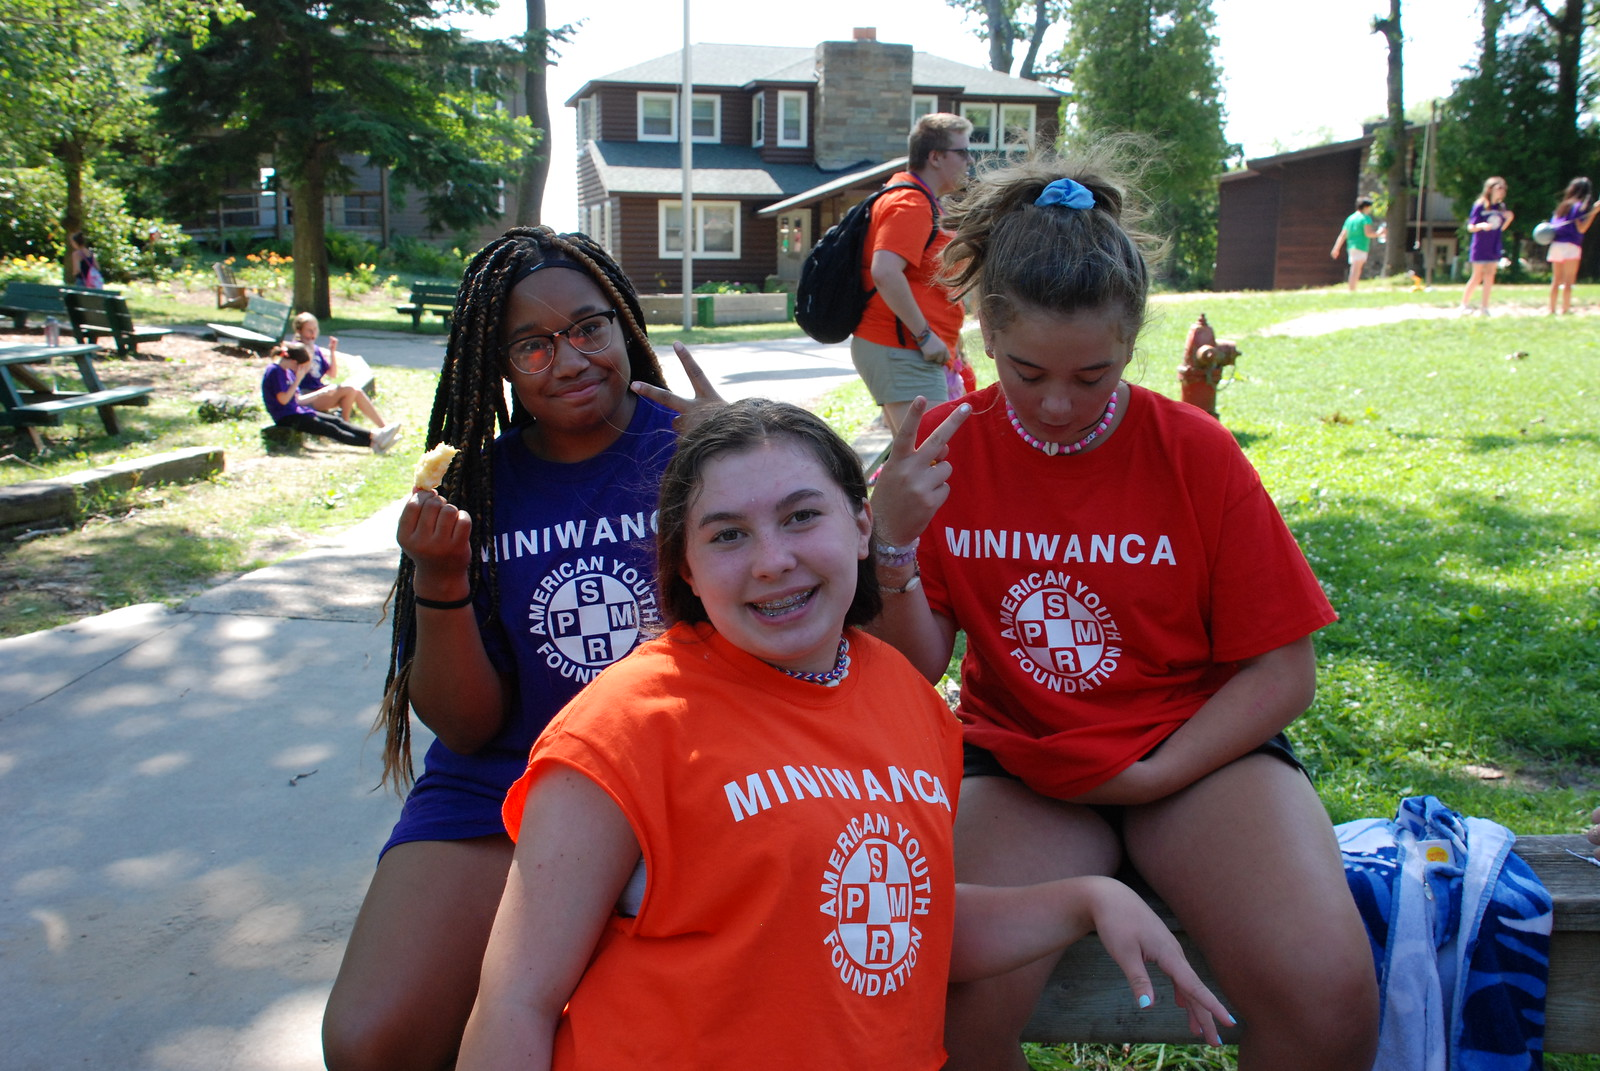 Miniwanca, Girls Camp, Fun Filled, Fun Day